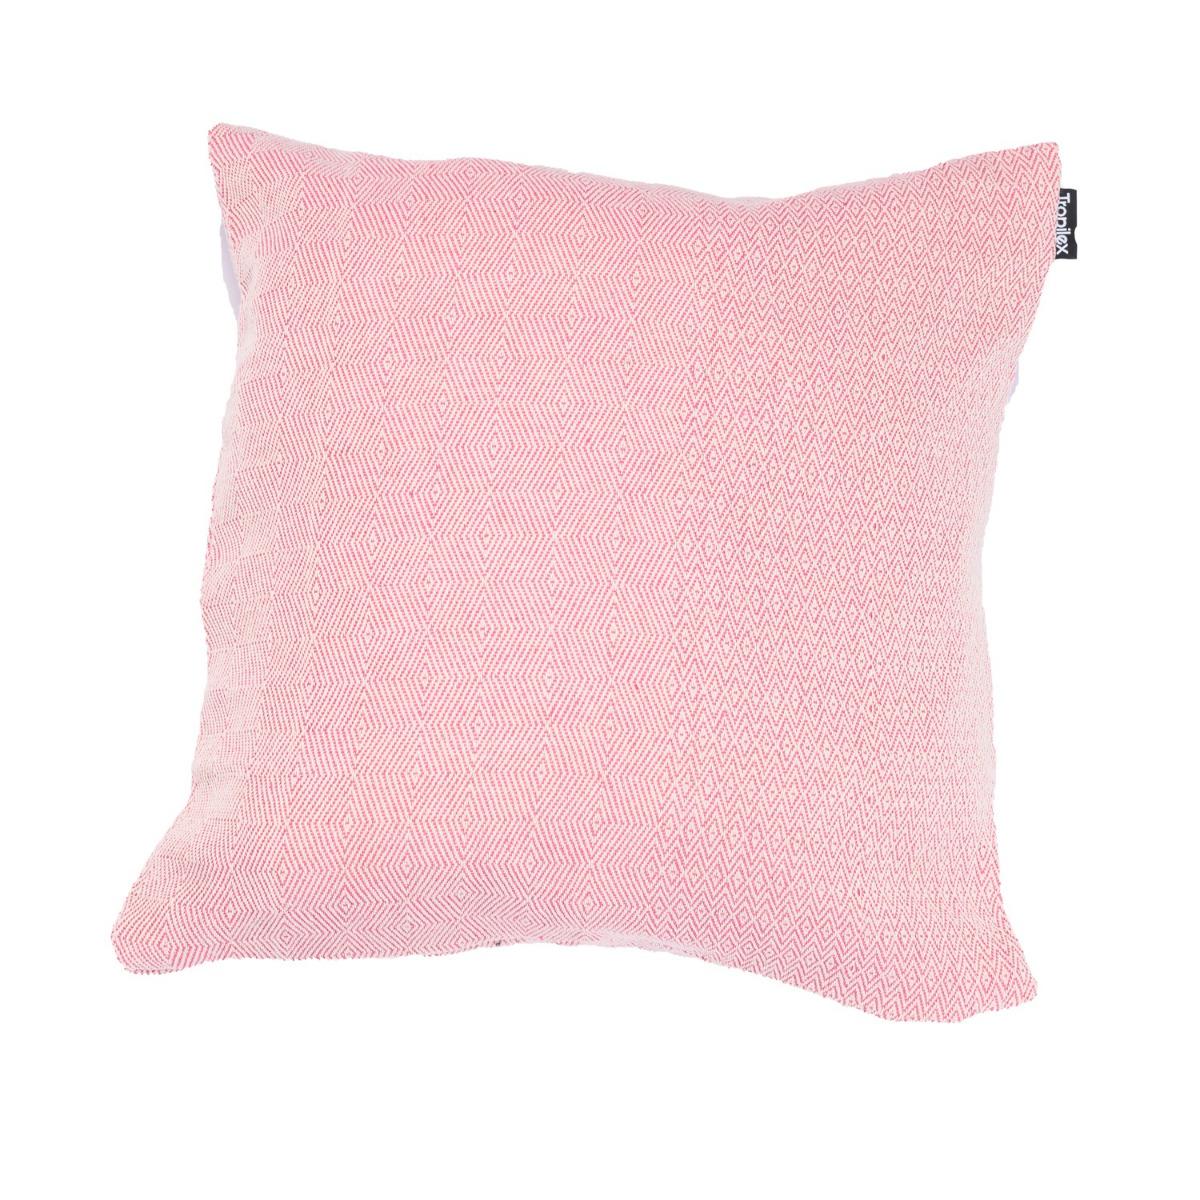 Kussen 'Natural' Pink - Tropilex �